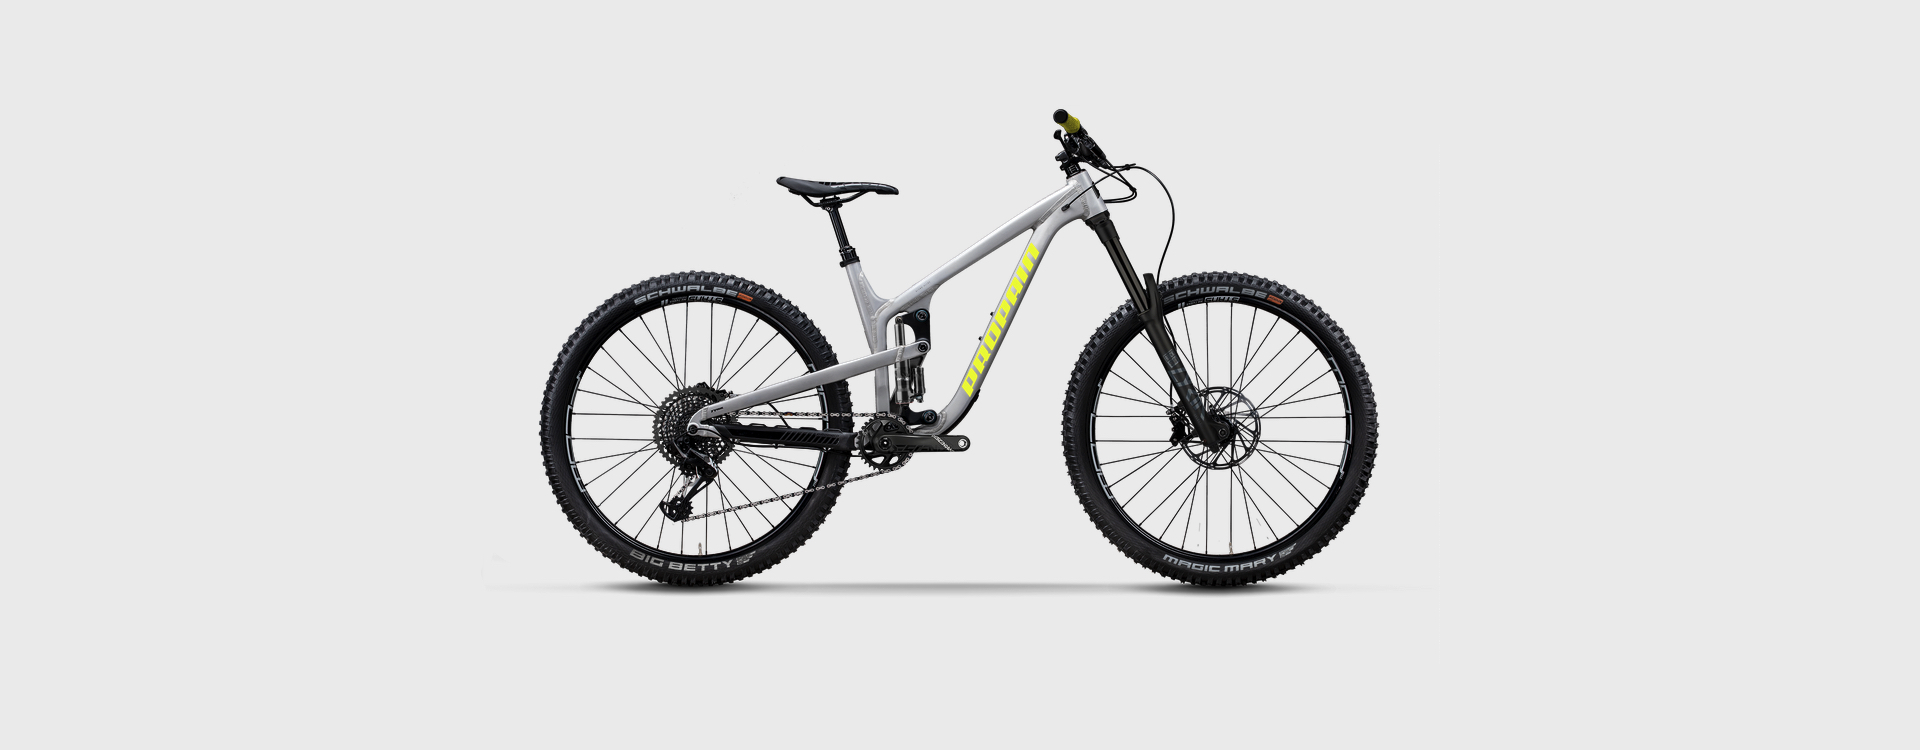 Bike Verleih Bad Salzdetfurth Propain Bikes Testcenter Niedersachsen Tyee 5 - AL - L - 650B - Raw - 1920x750